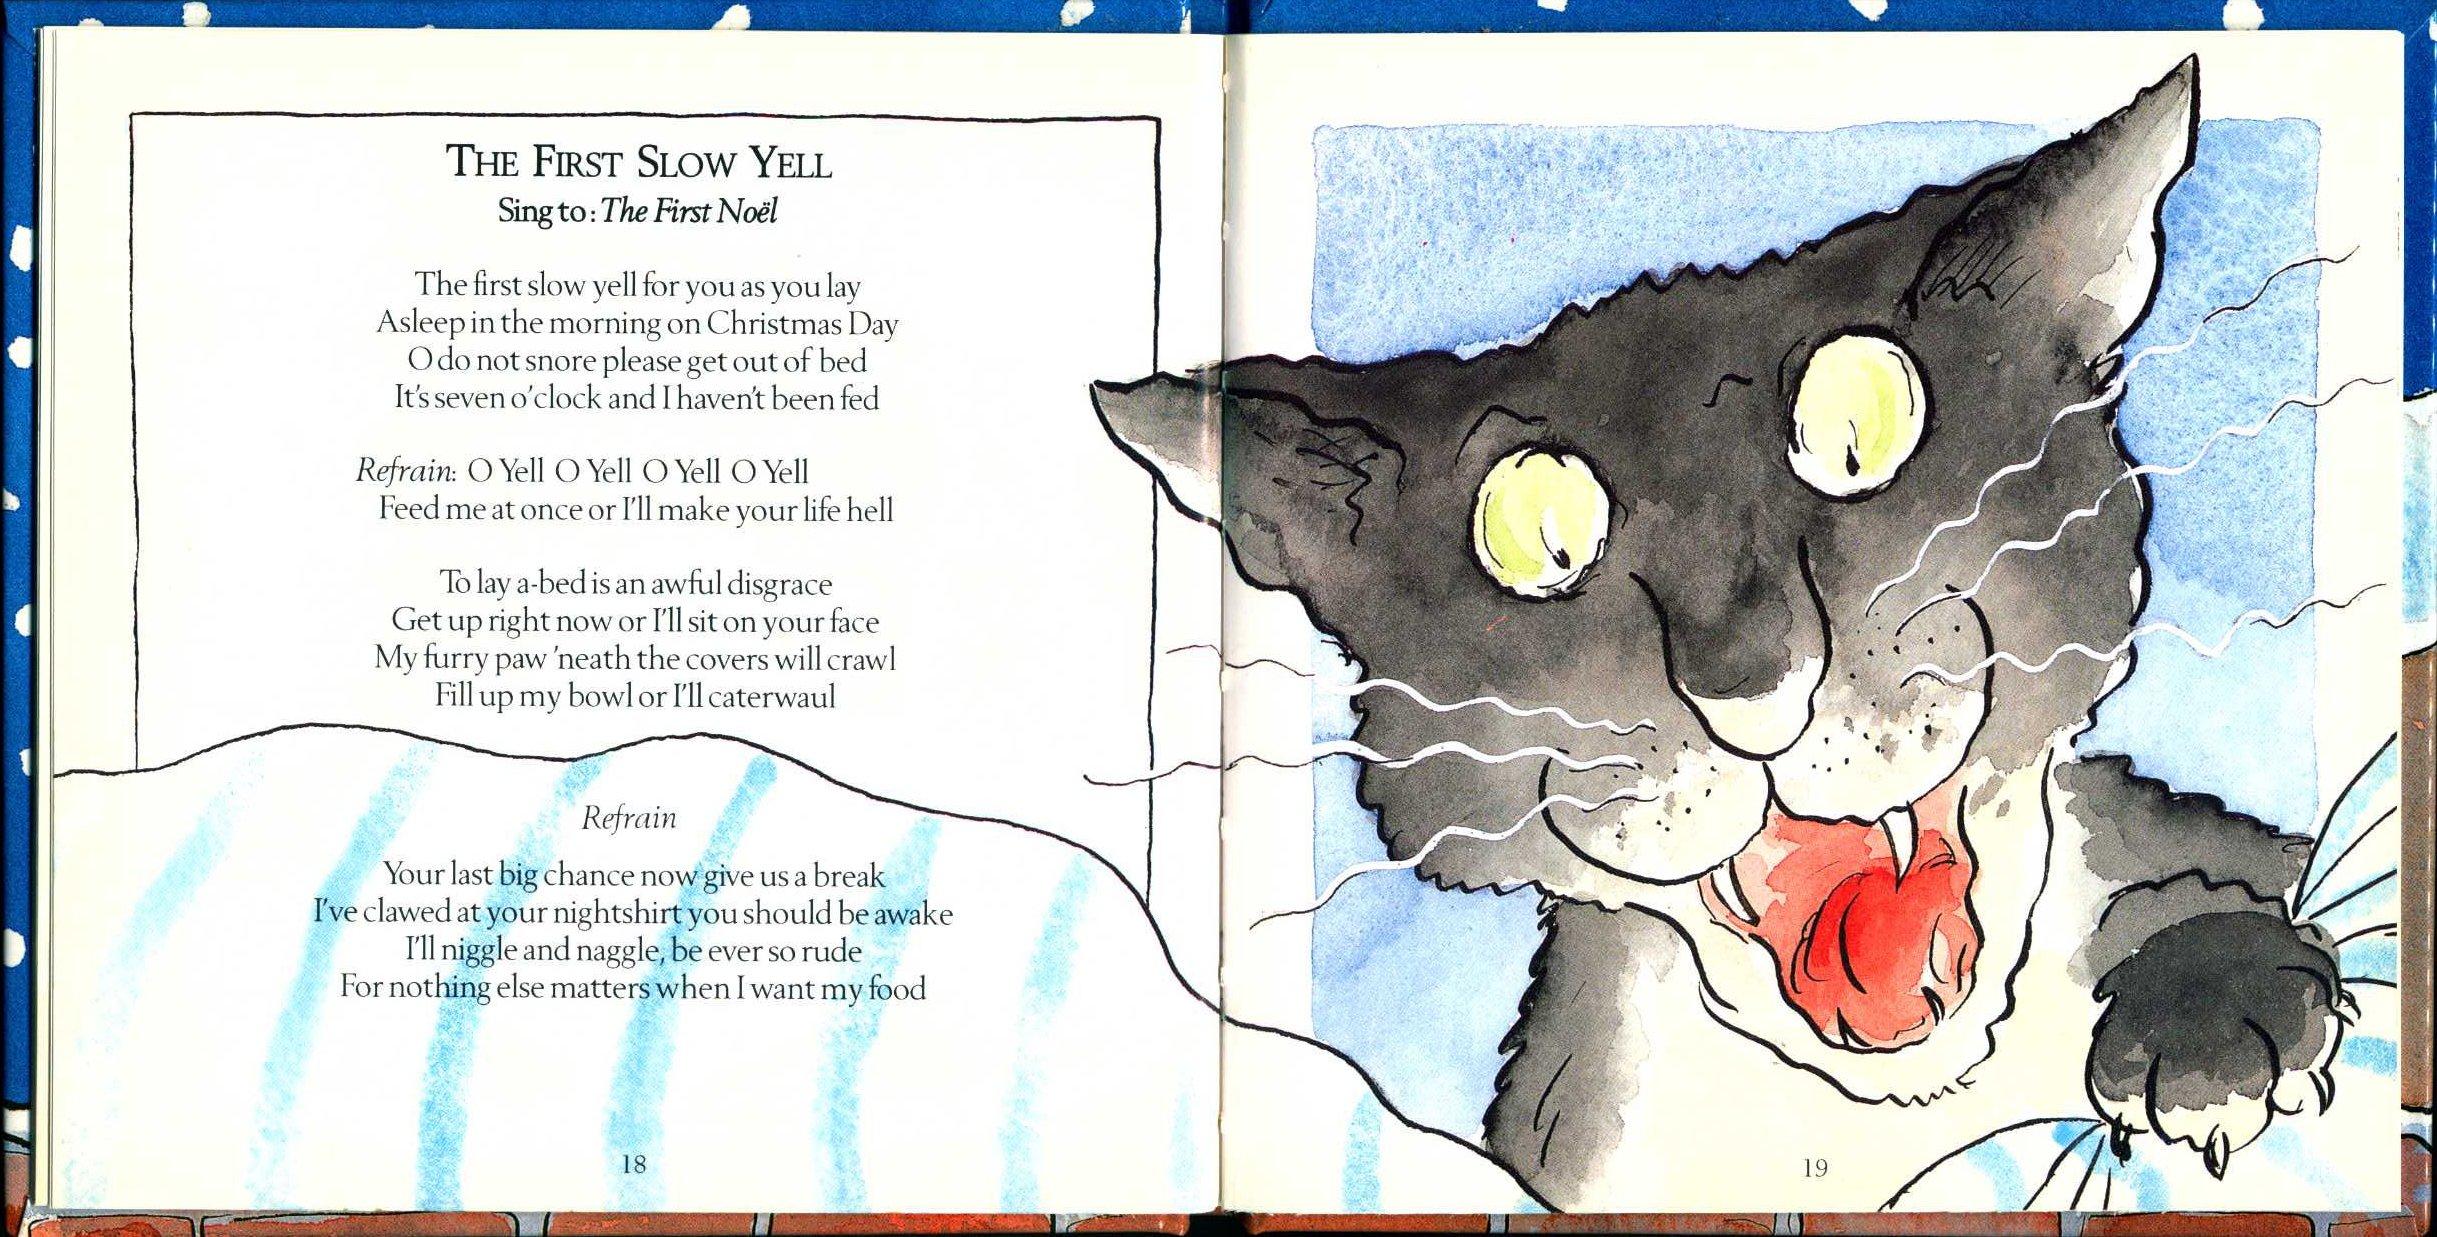 Julie and John Hope. Christmas carols for cats. Illustrations by Sue Hellard. London: Bantam, 1996.